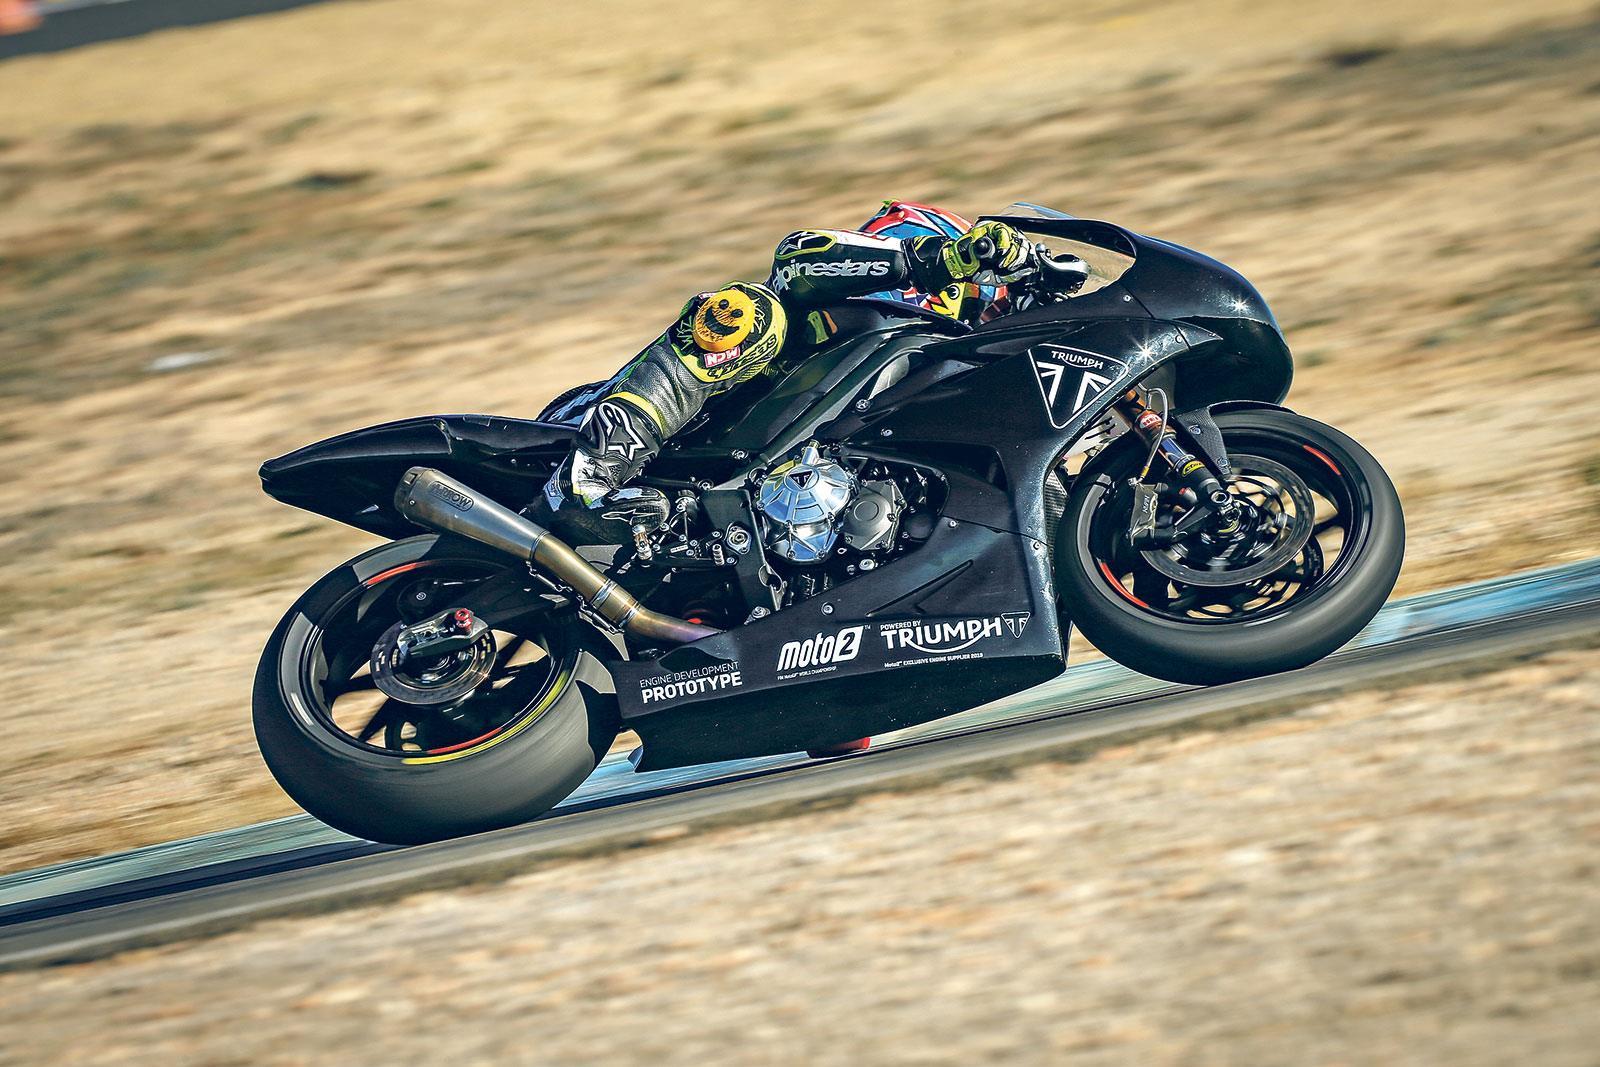 Triumph 765 Moto2 bike